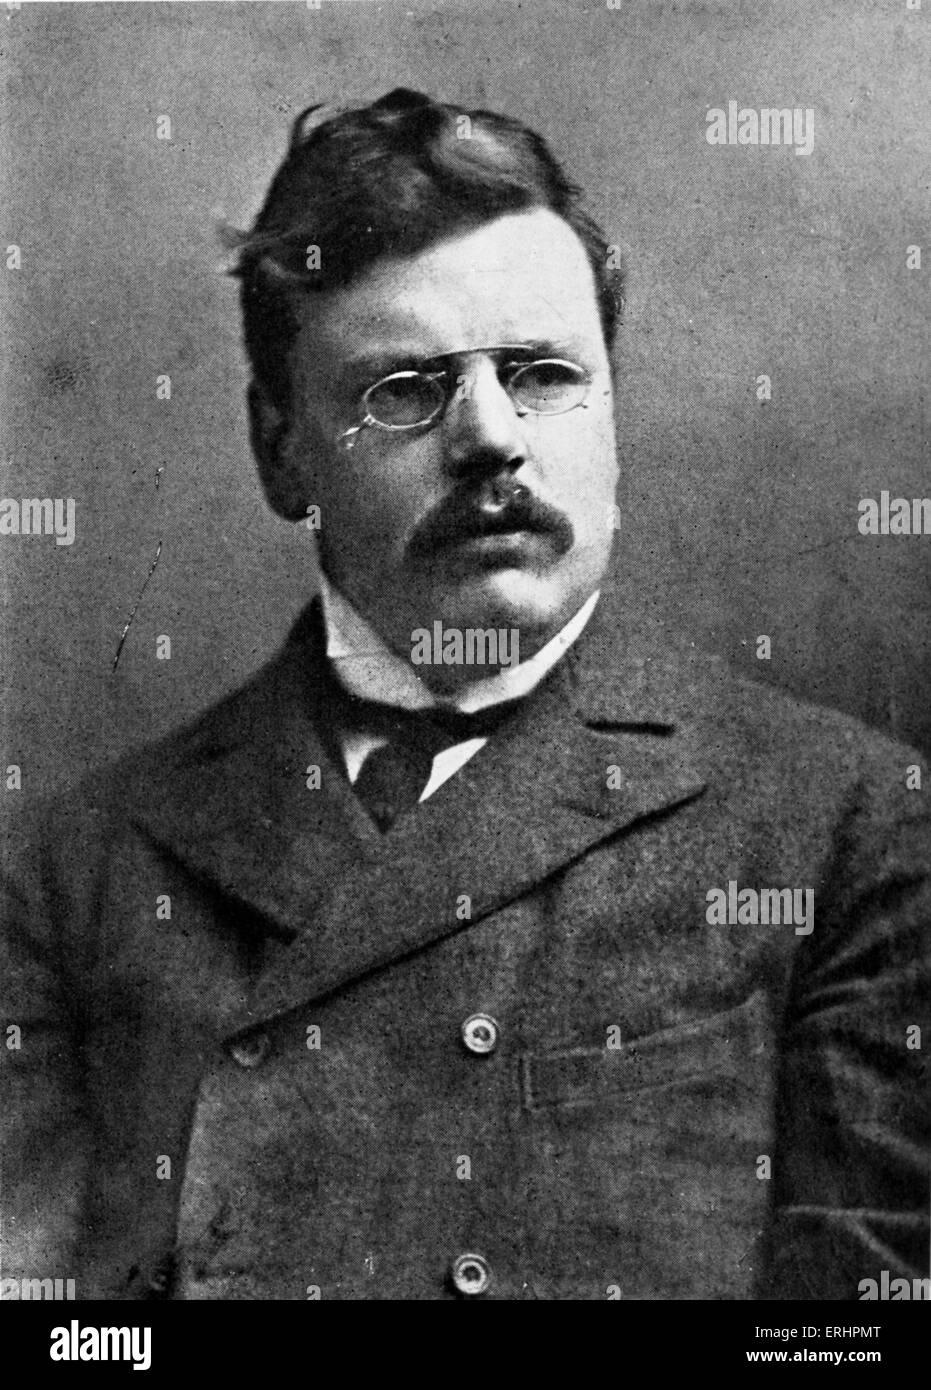 Gilbert Keith Chesterton - English writer: 29 May 1874 - 14 June 1936. - Stock Image